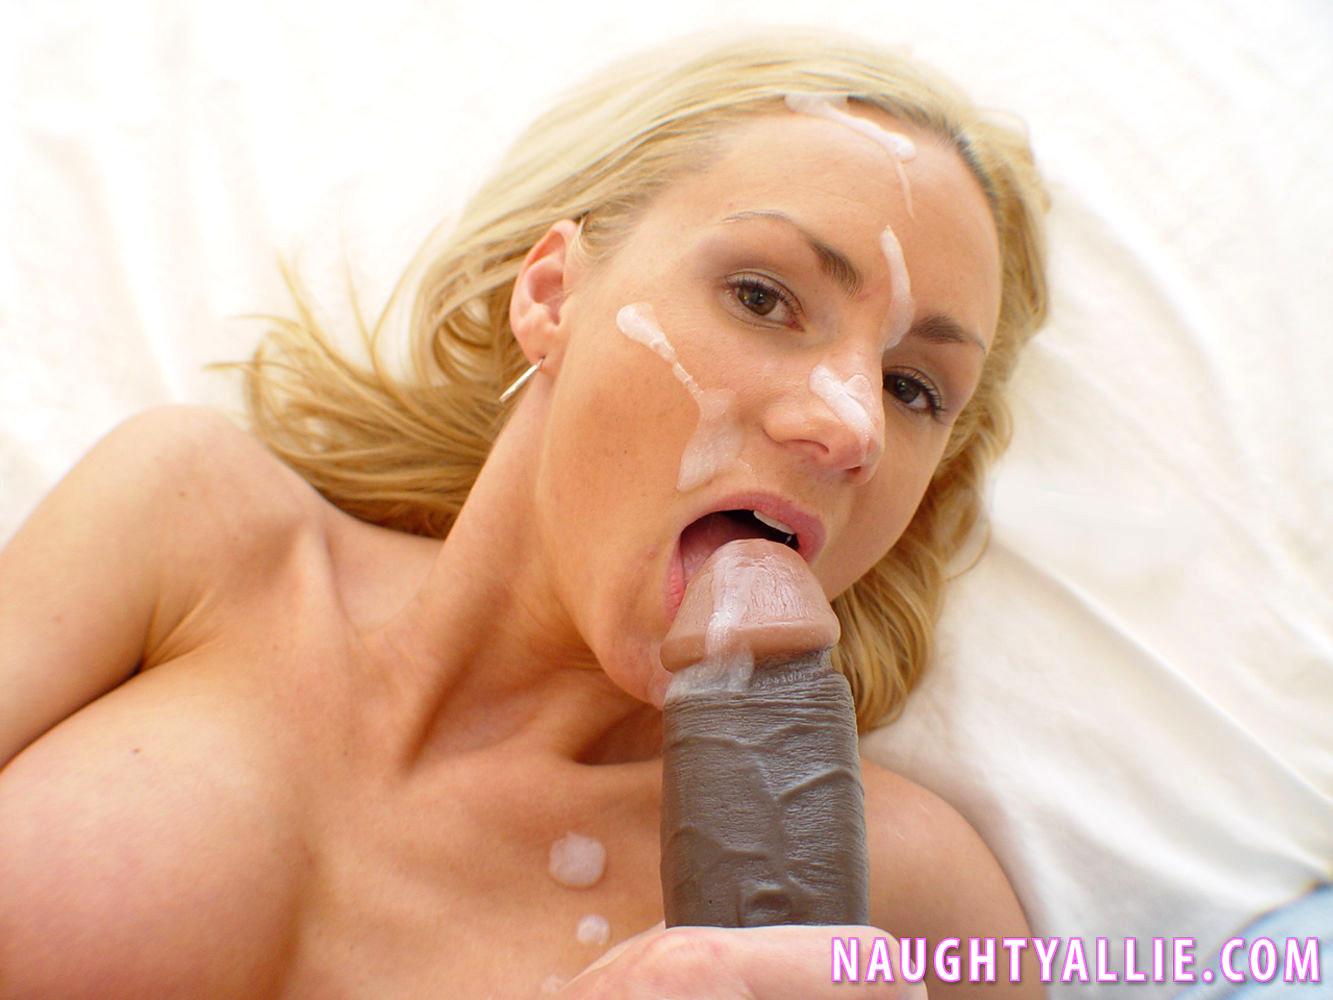 Busty naughty allie sucks her first black cock